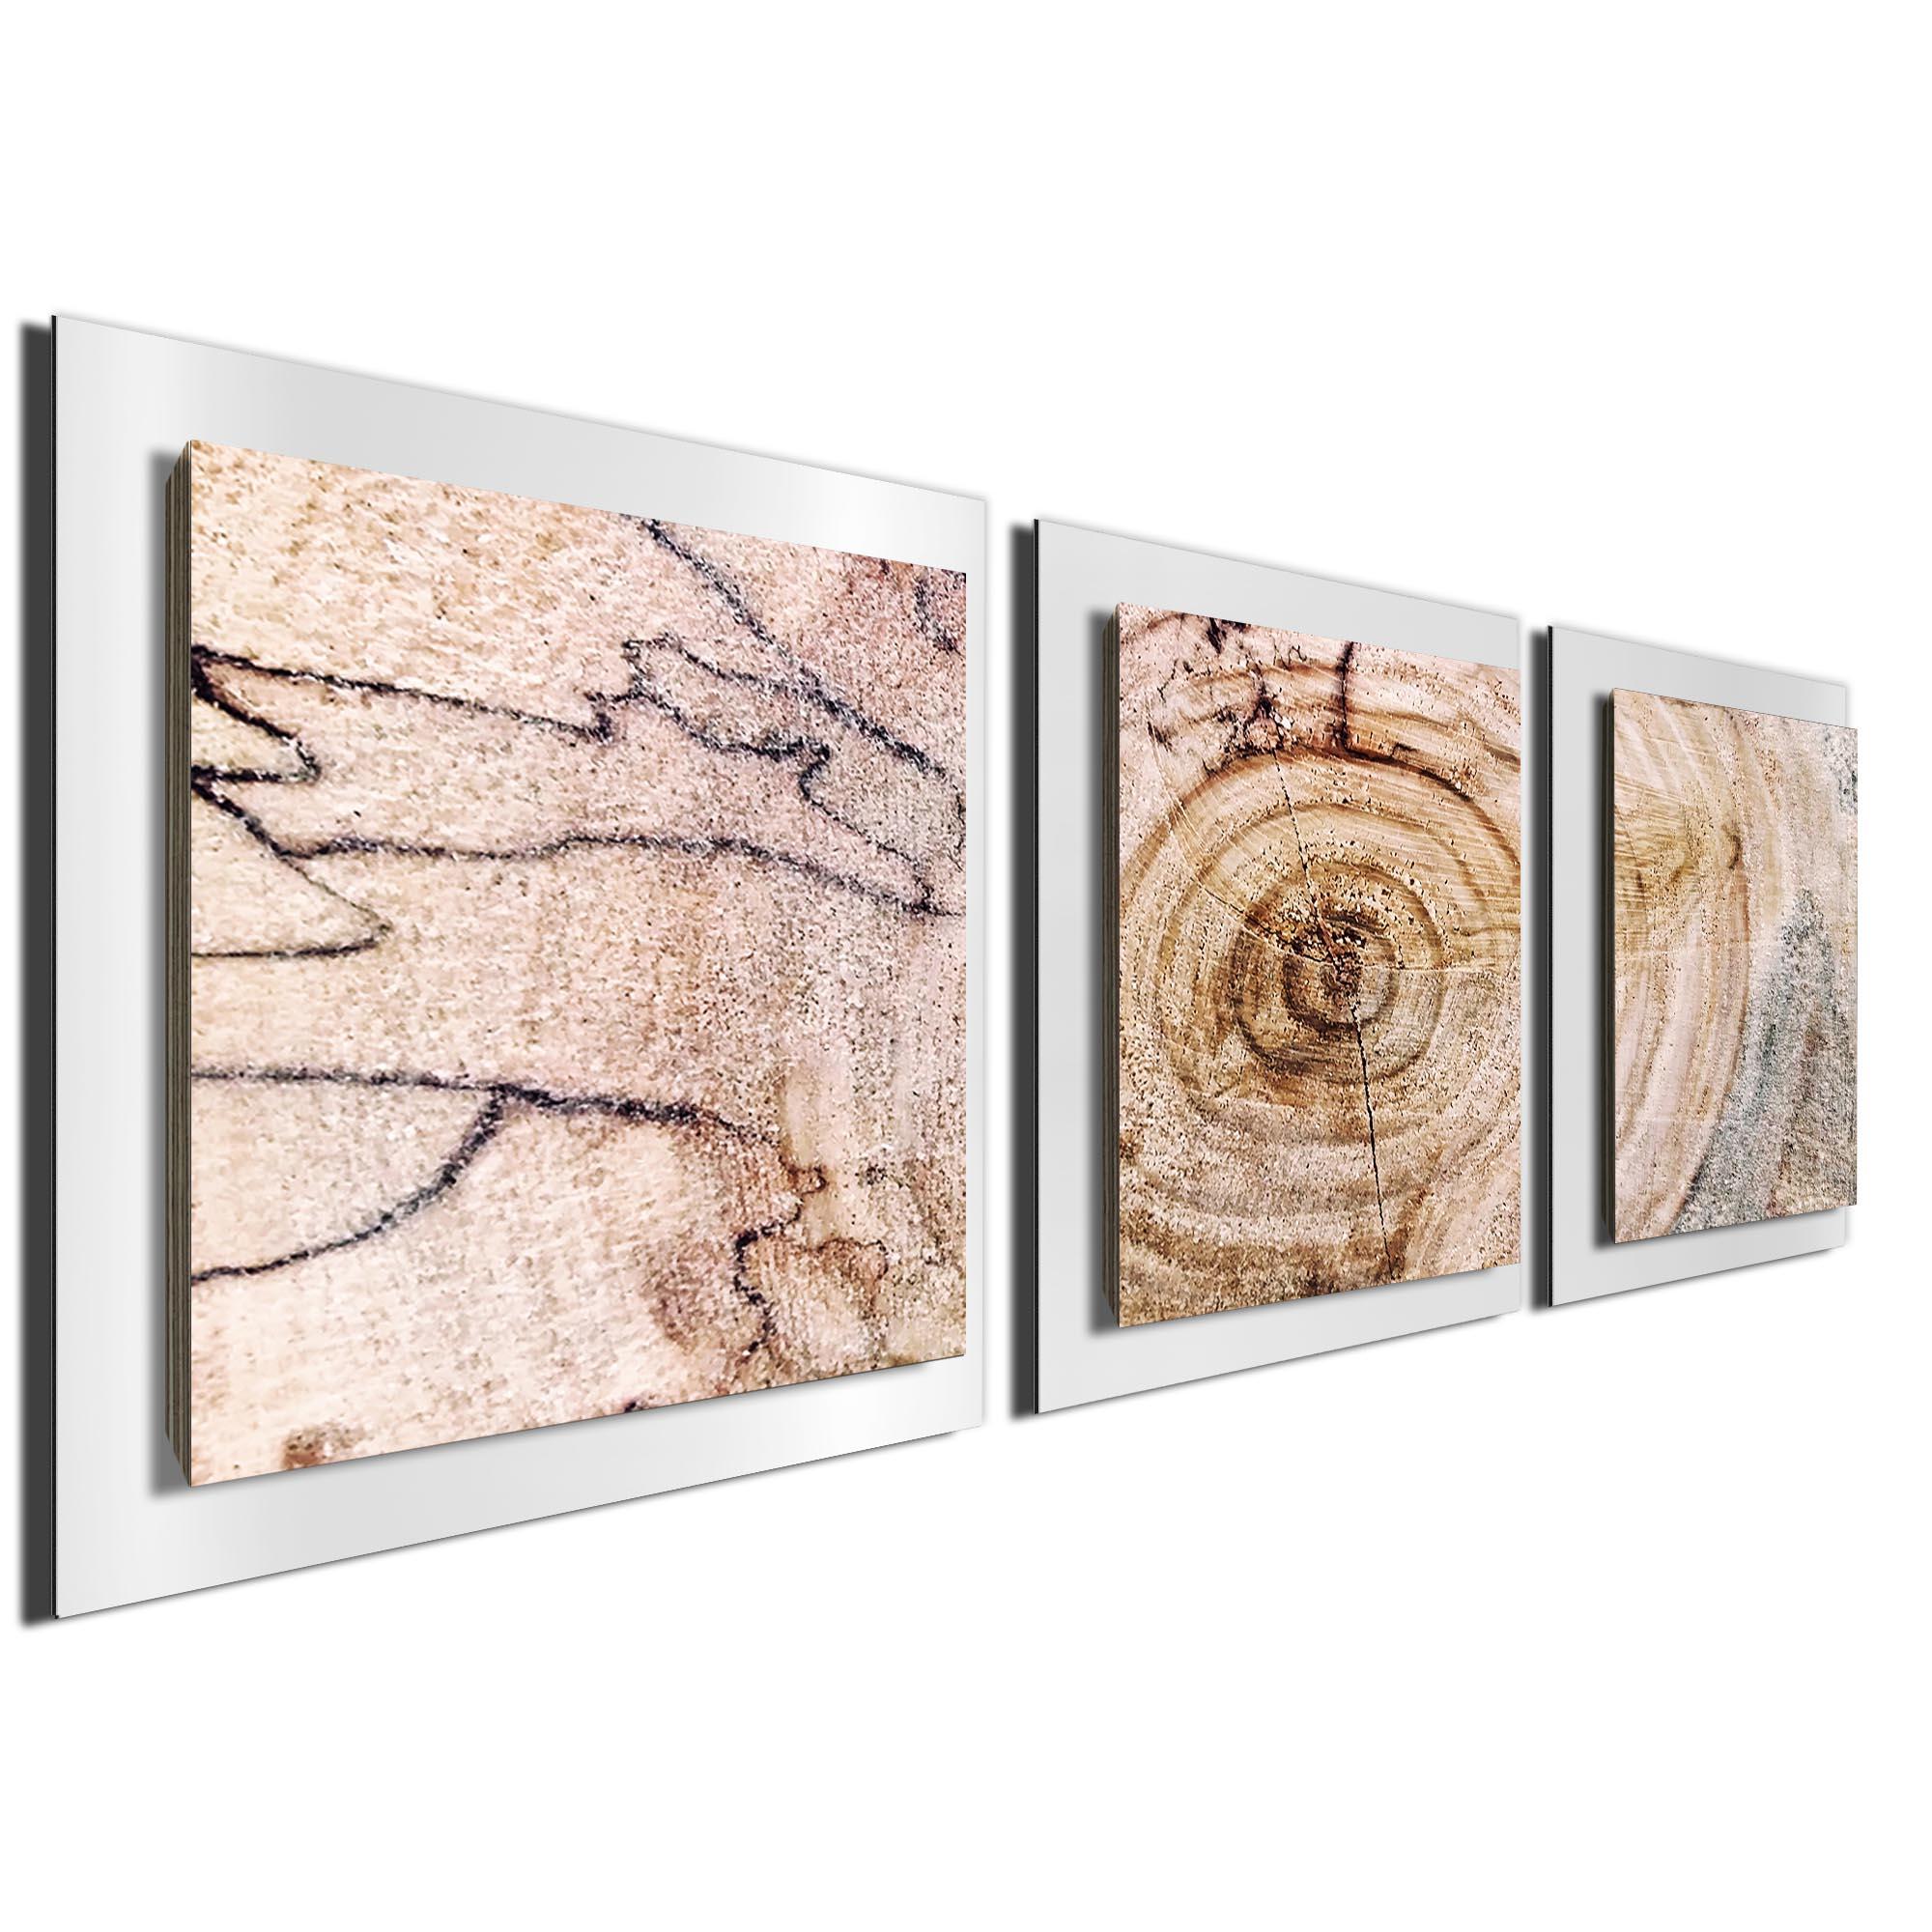 Aged Wood Essence White by Adam Schwoeppe Rustic Modern Style Wood Wall Art - Image 2